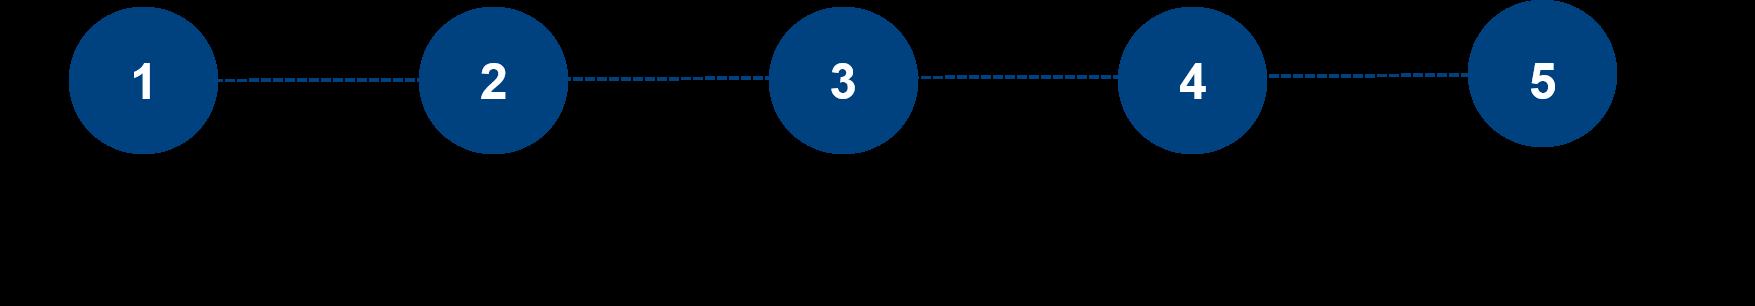 5 pasos Garantia ATM